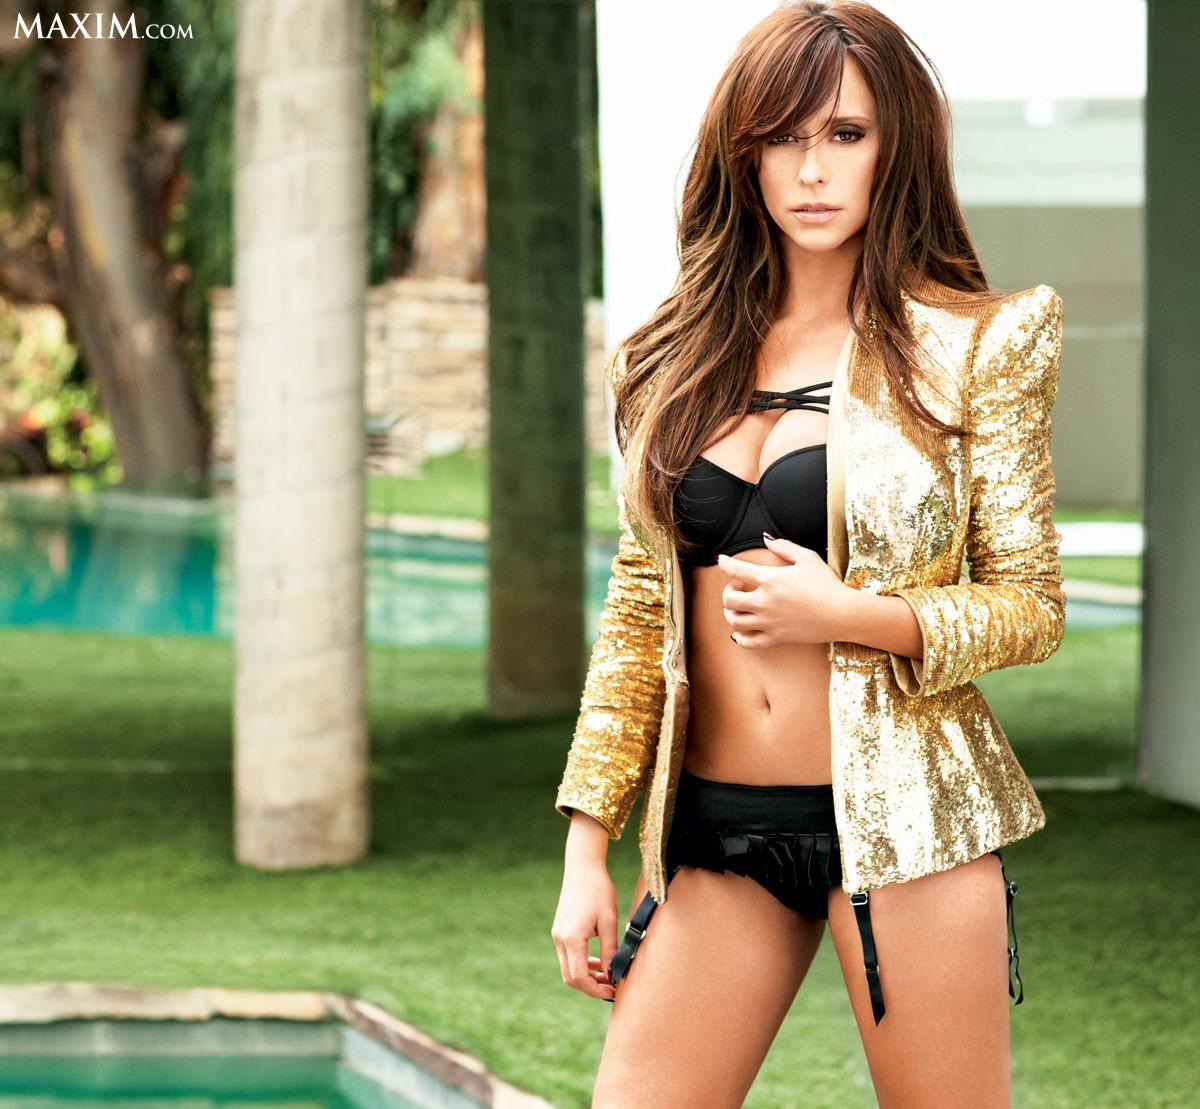 http://1.bp.blogspot.com/-GxVZdgxklyw/T1jPO62TinI/AAAAAAAAIZI/rltWDcTeDzc/s1600/Jennifer-Love-Hewitt-4.jpg